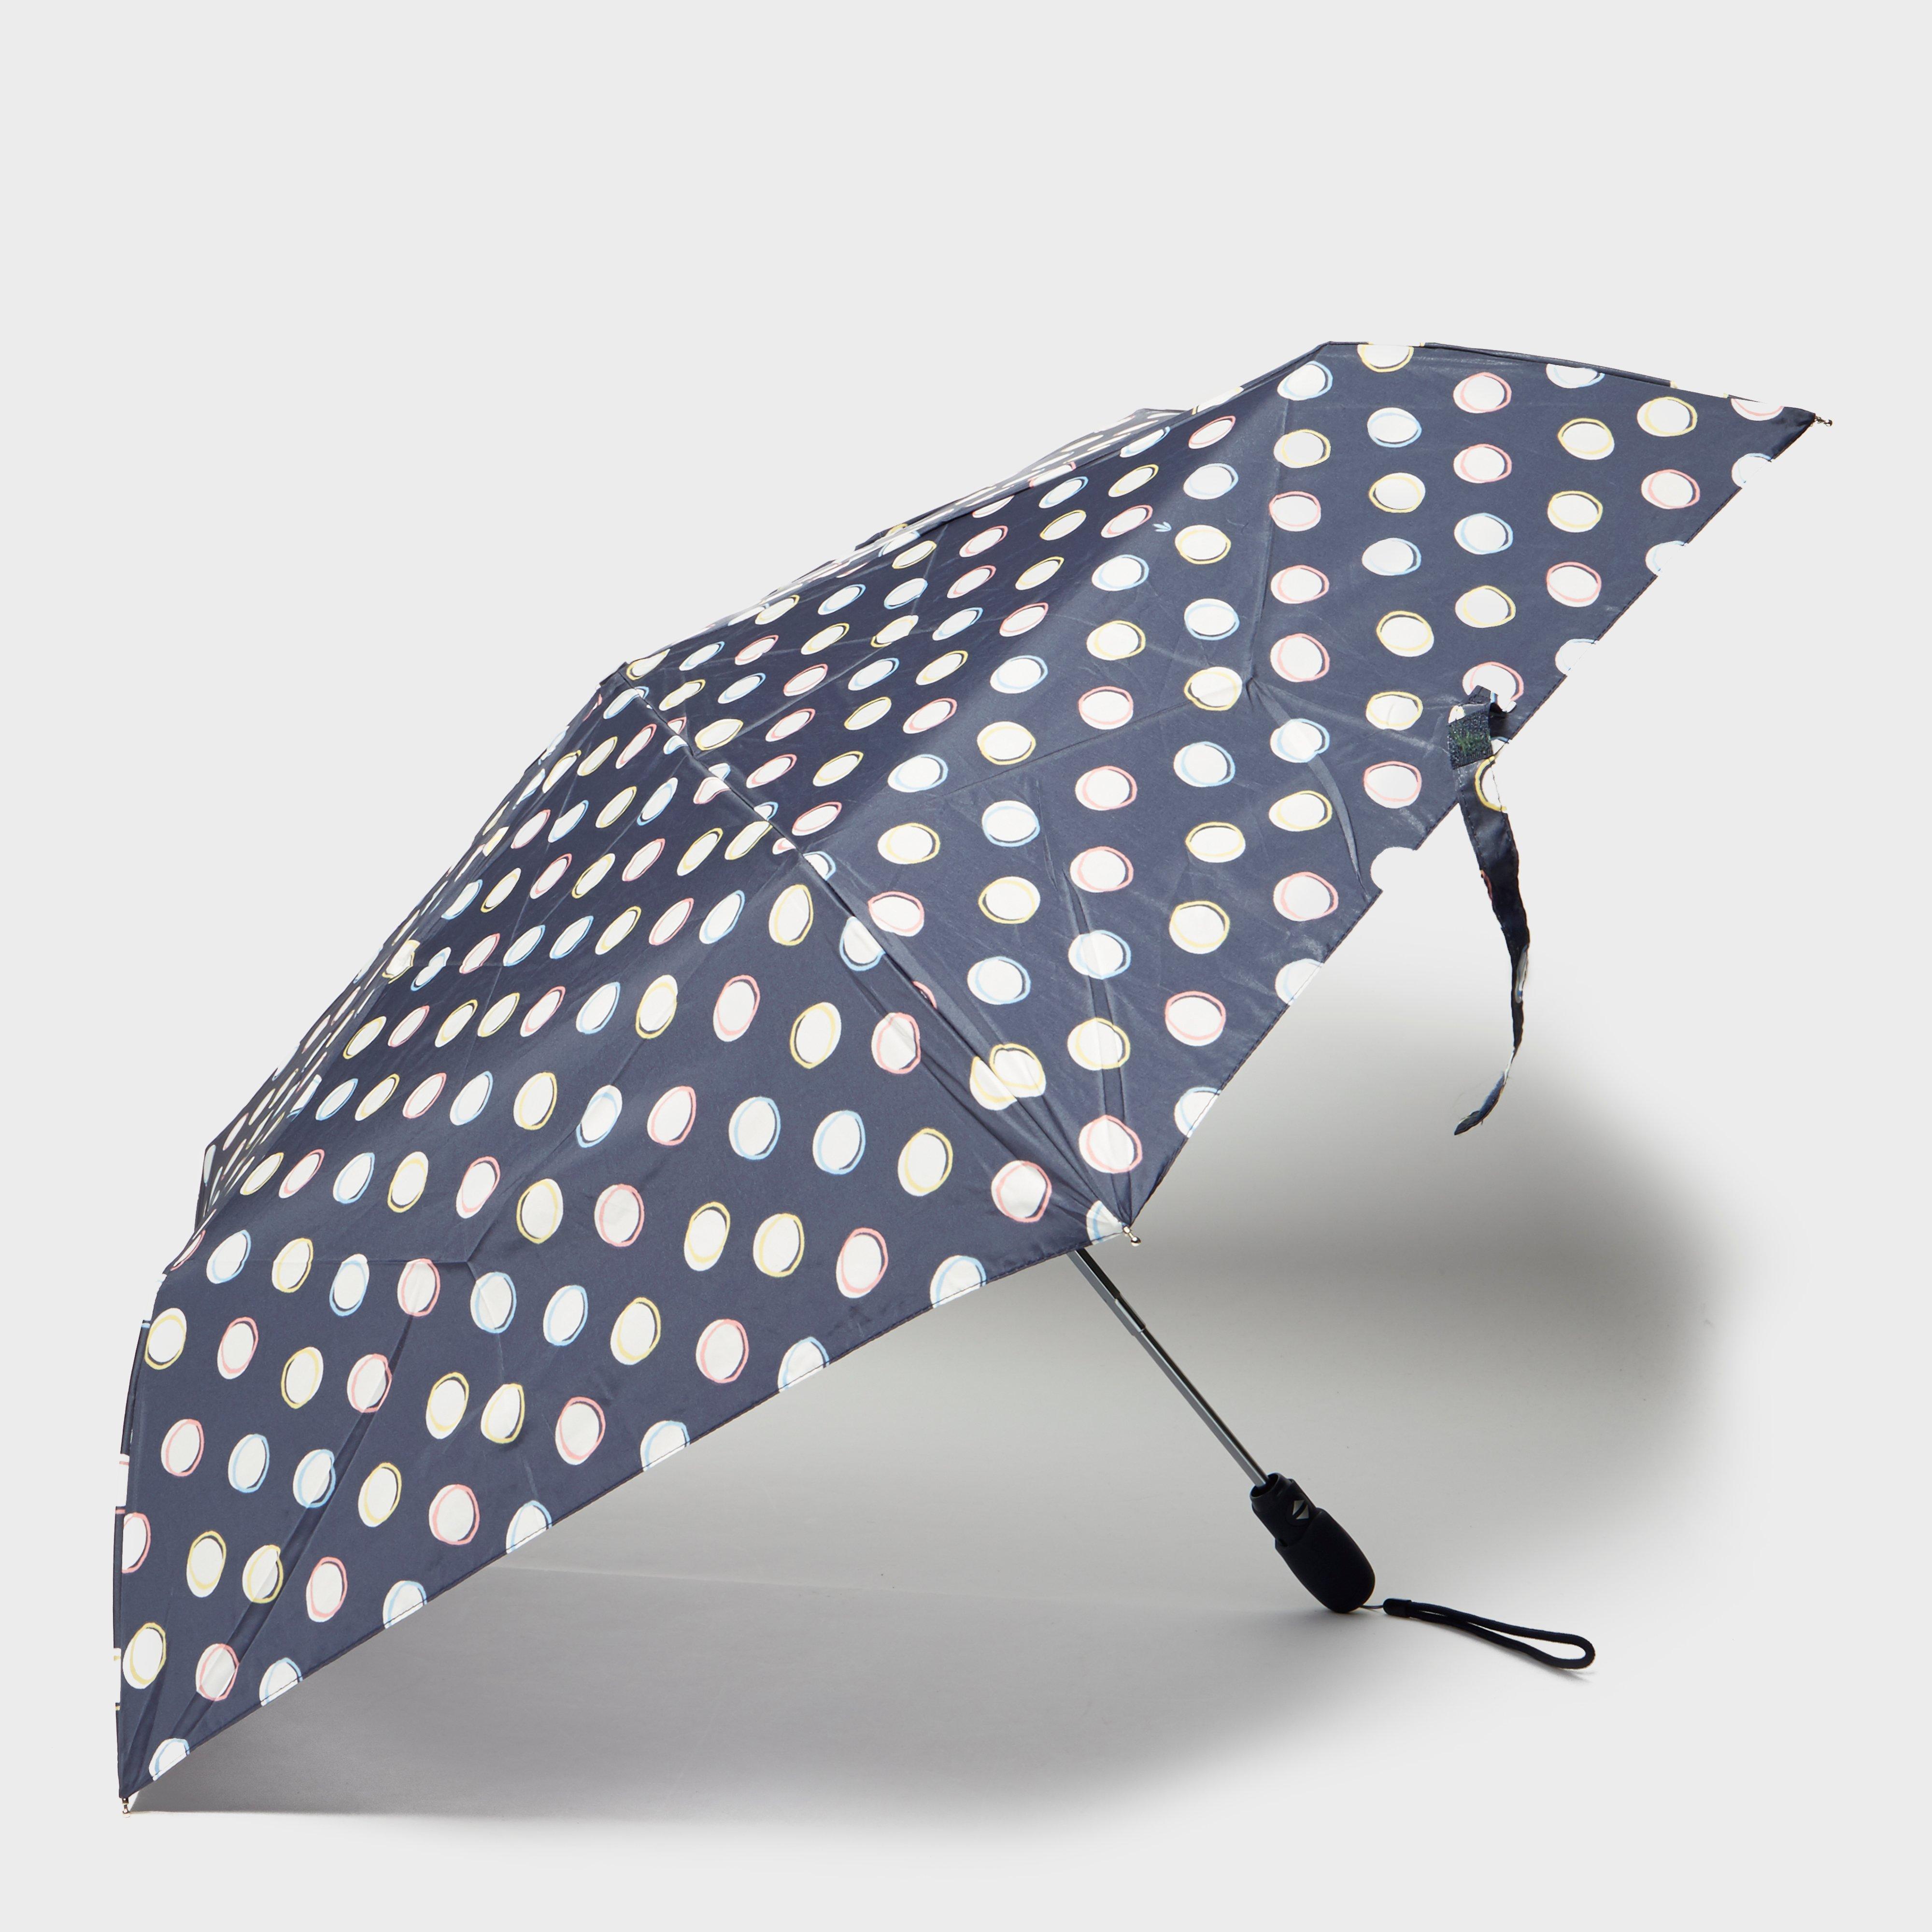 Fulton Fulton Superslim 2 Polka Dot Umbrella - N/A, N/A